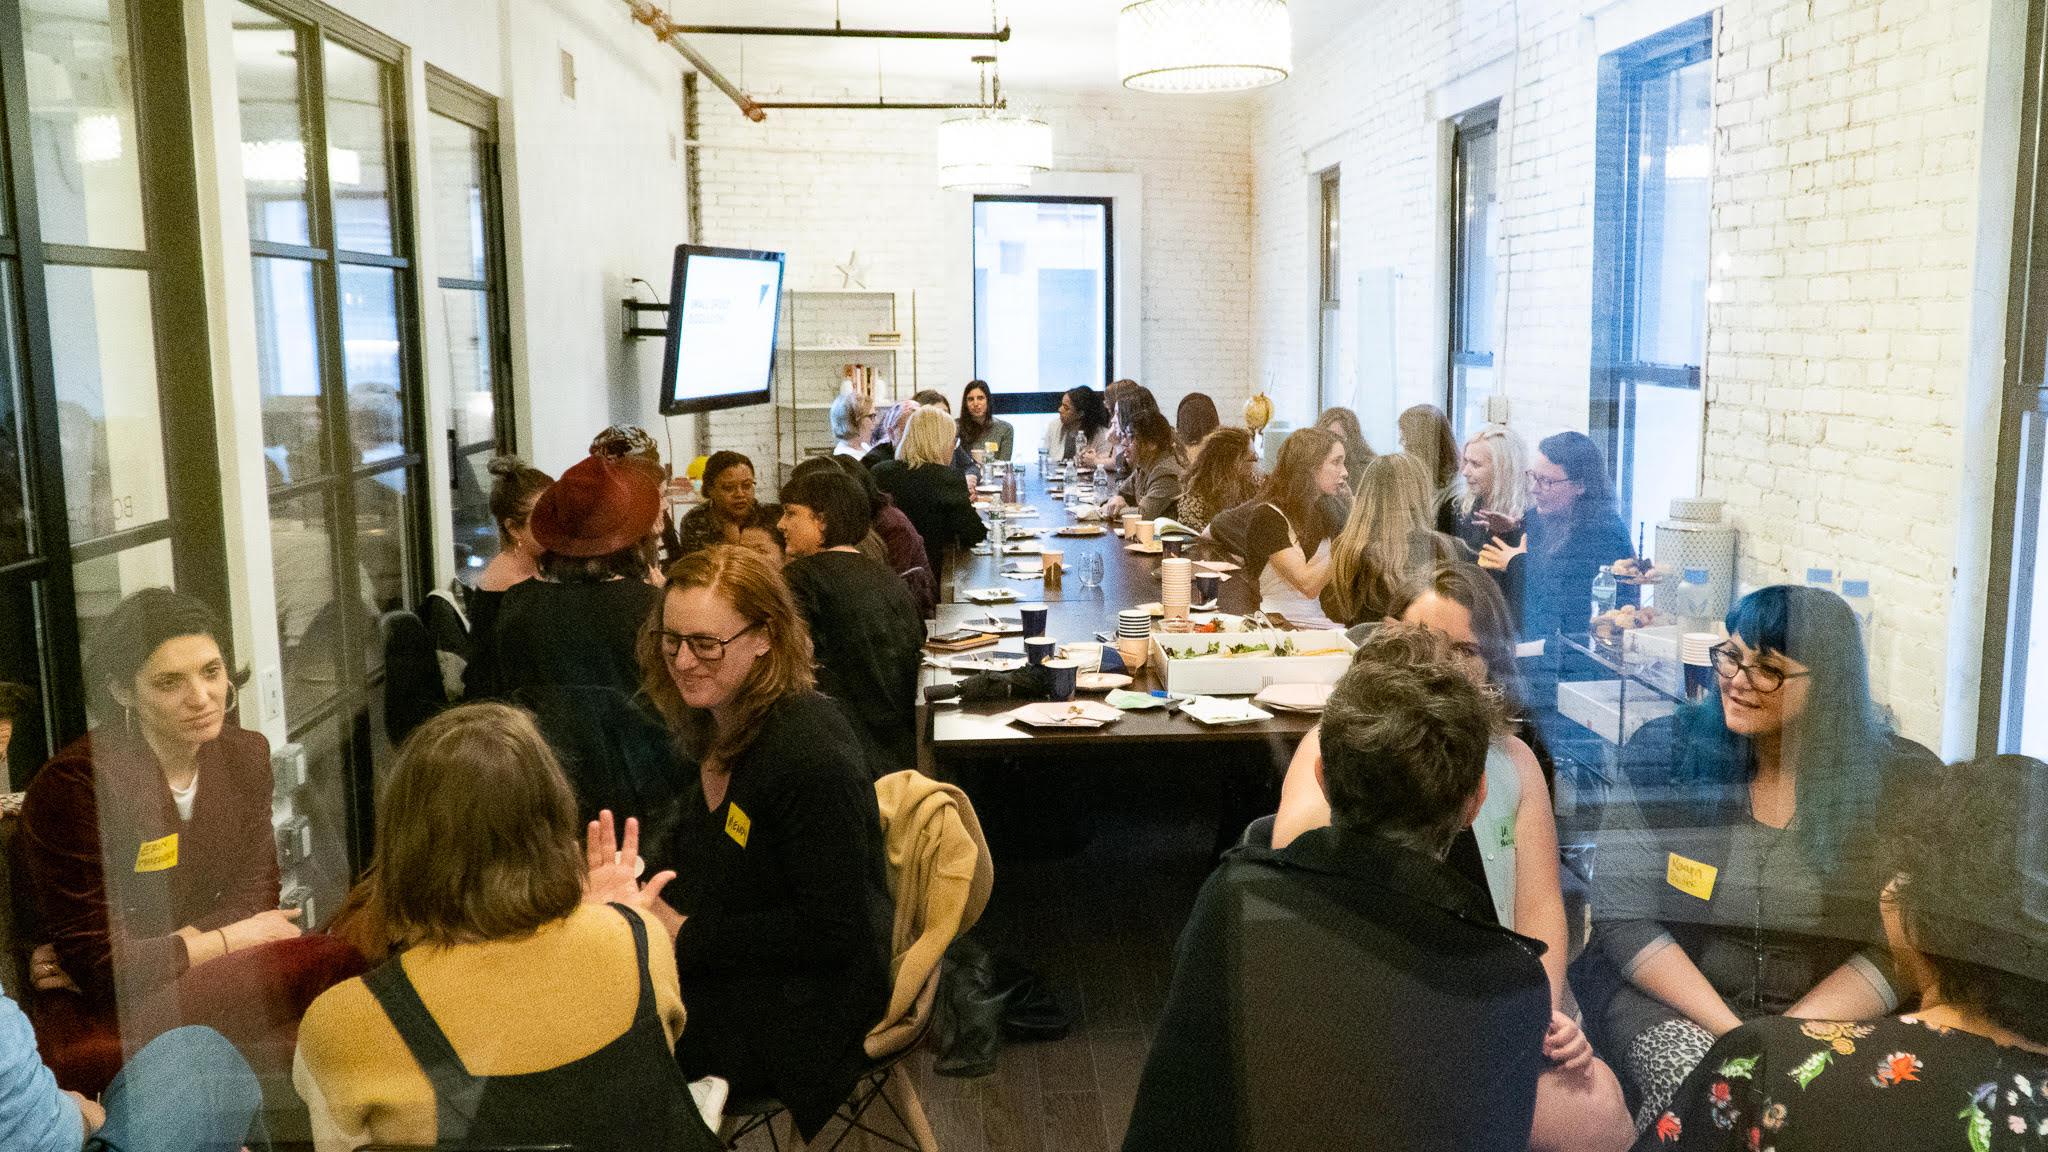 powerbitches-feminist-entrepreneurs-unite-wide-shot.jpg